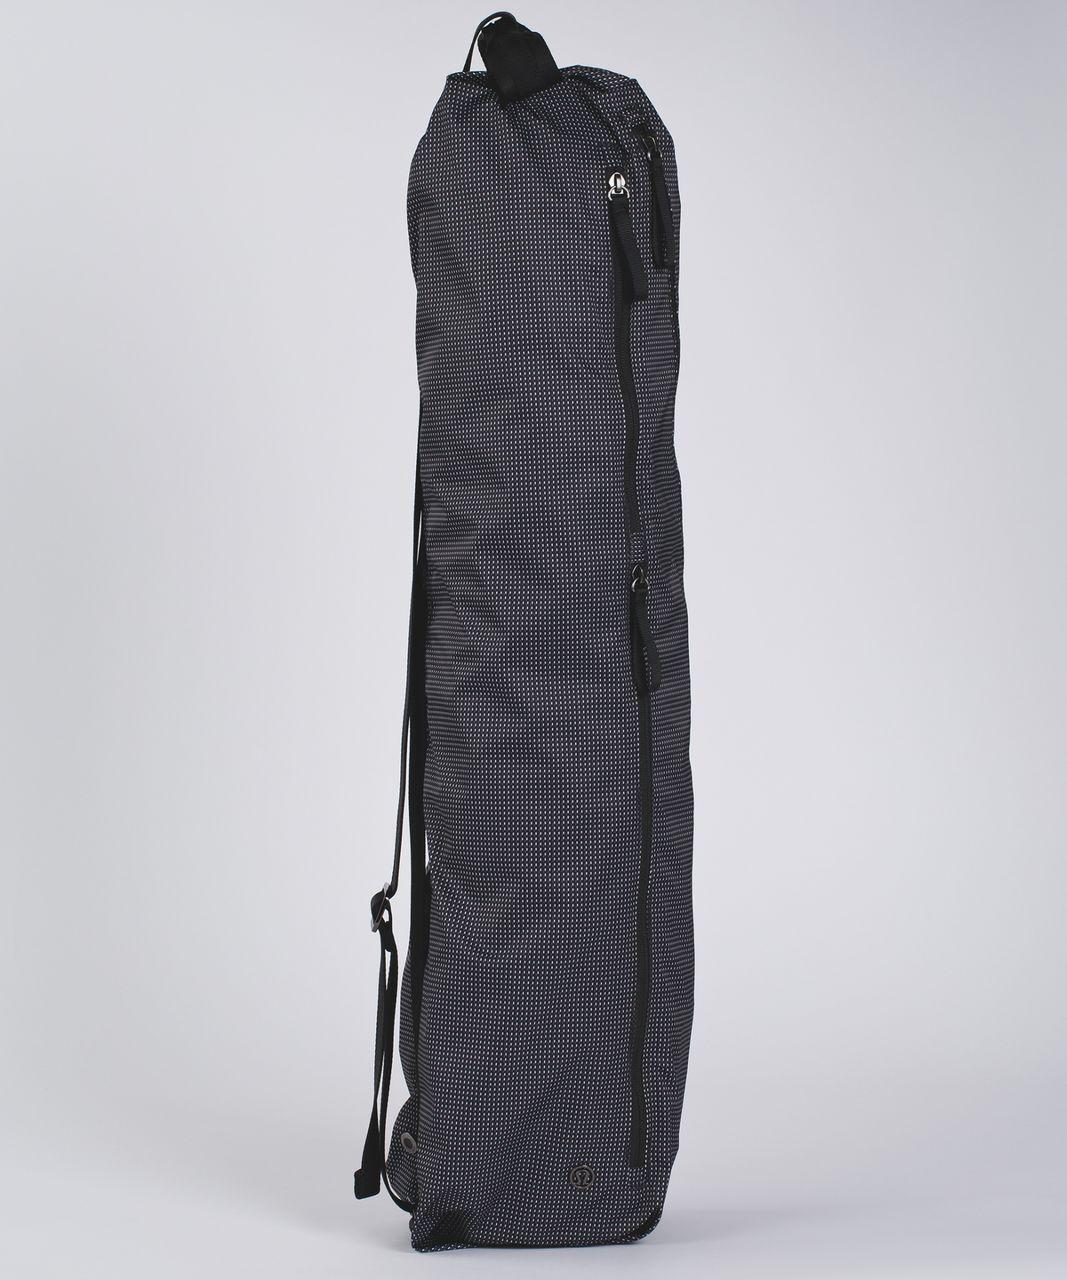 Lululemon The Yoga Bag Y Check Print White Black